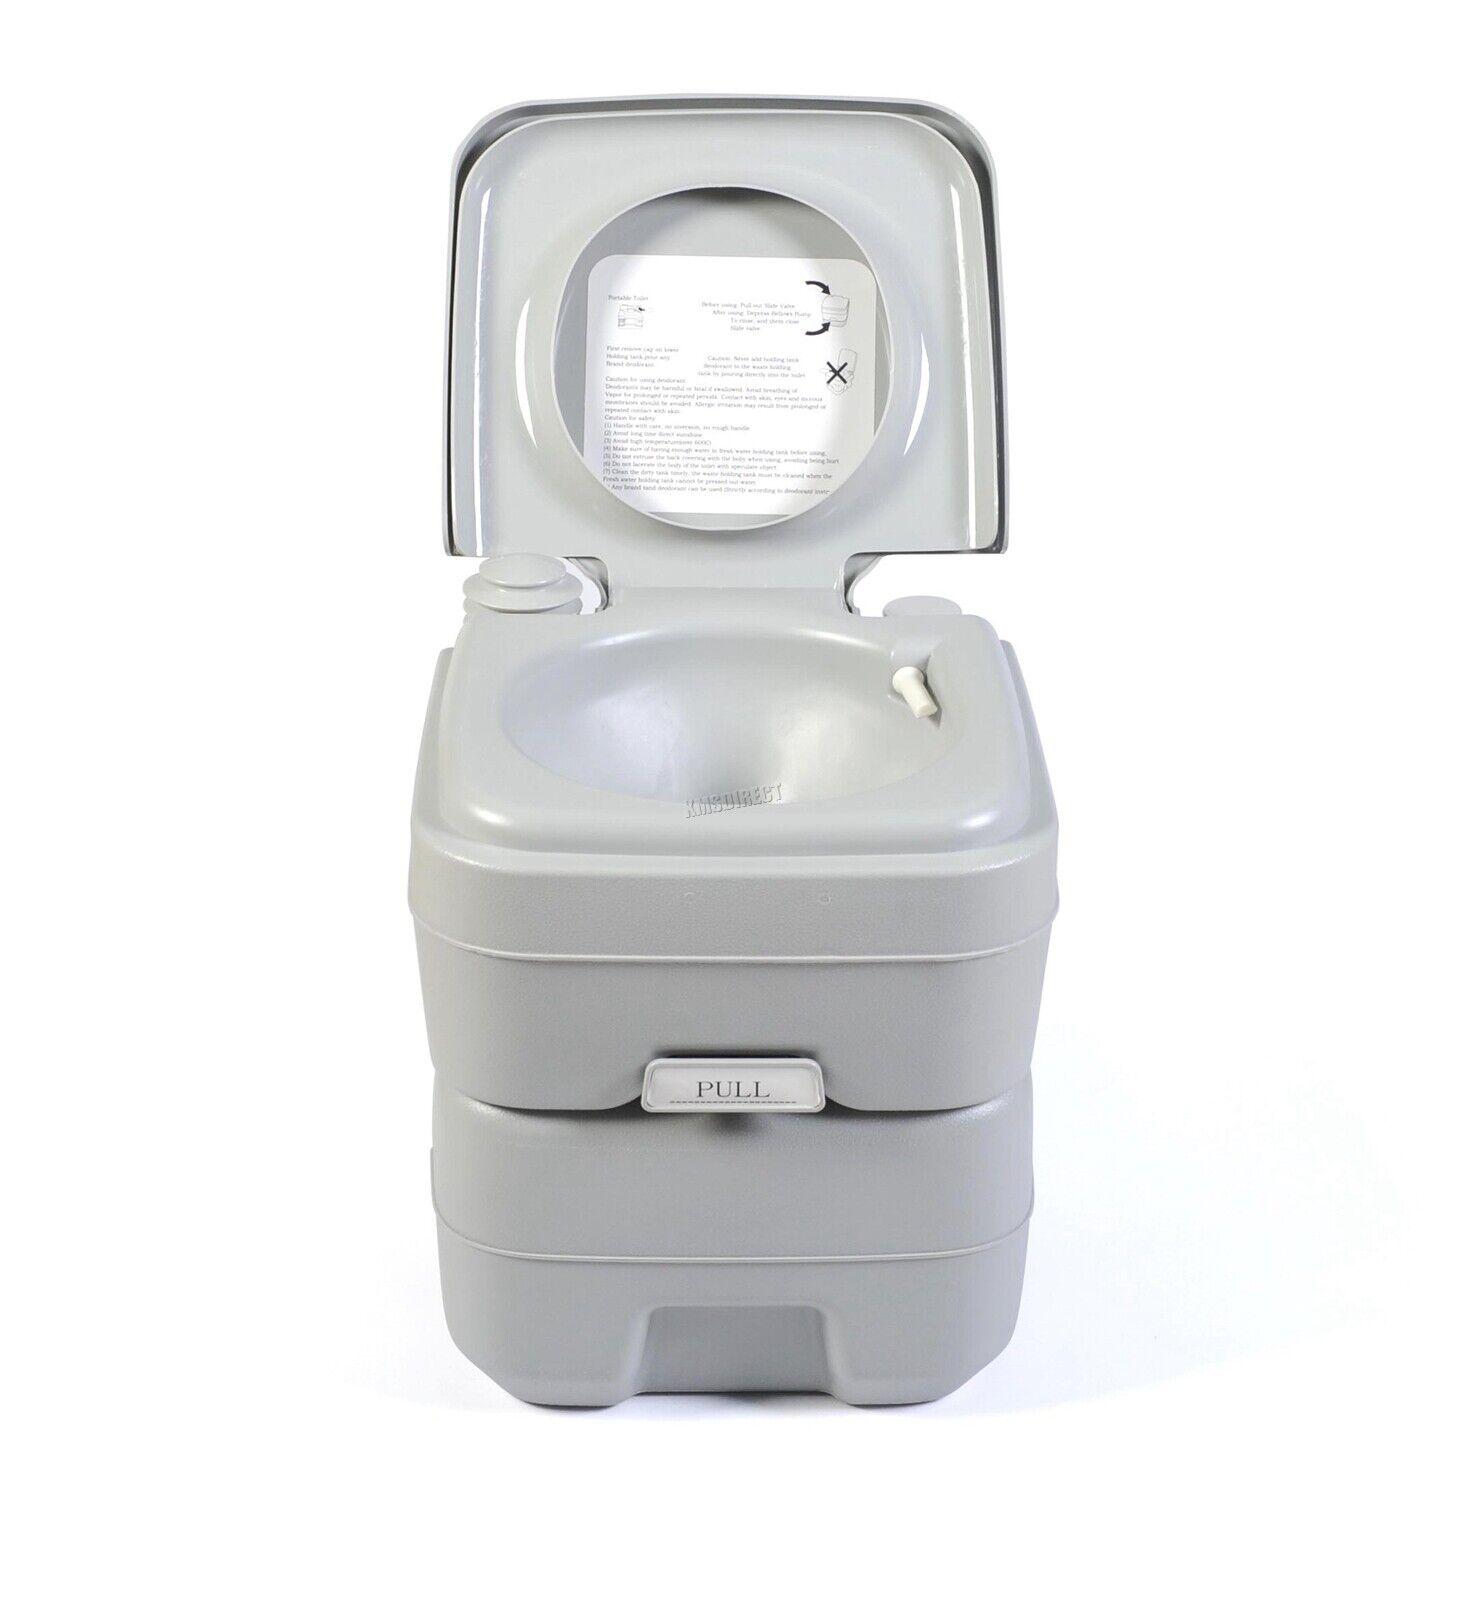 FoxHunter 20L Portable Toilet Flush Caravan Camping Travel WC Loo Porta Potty 4